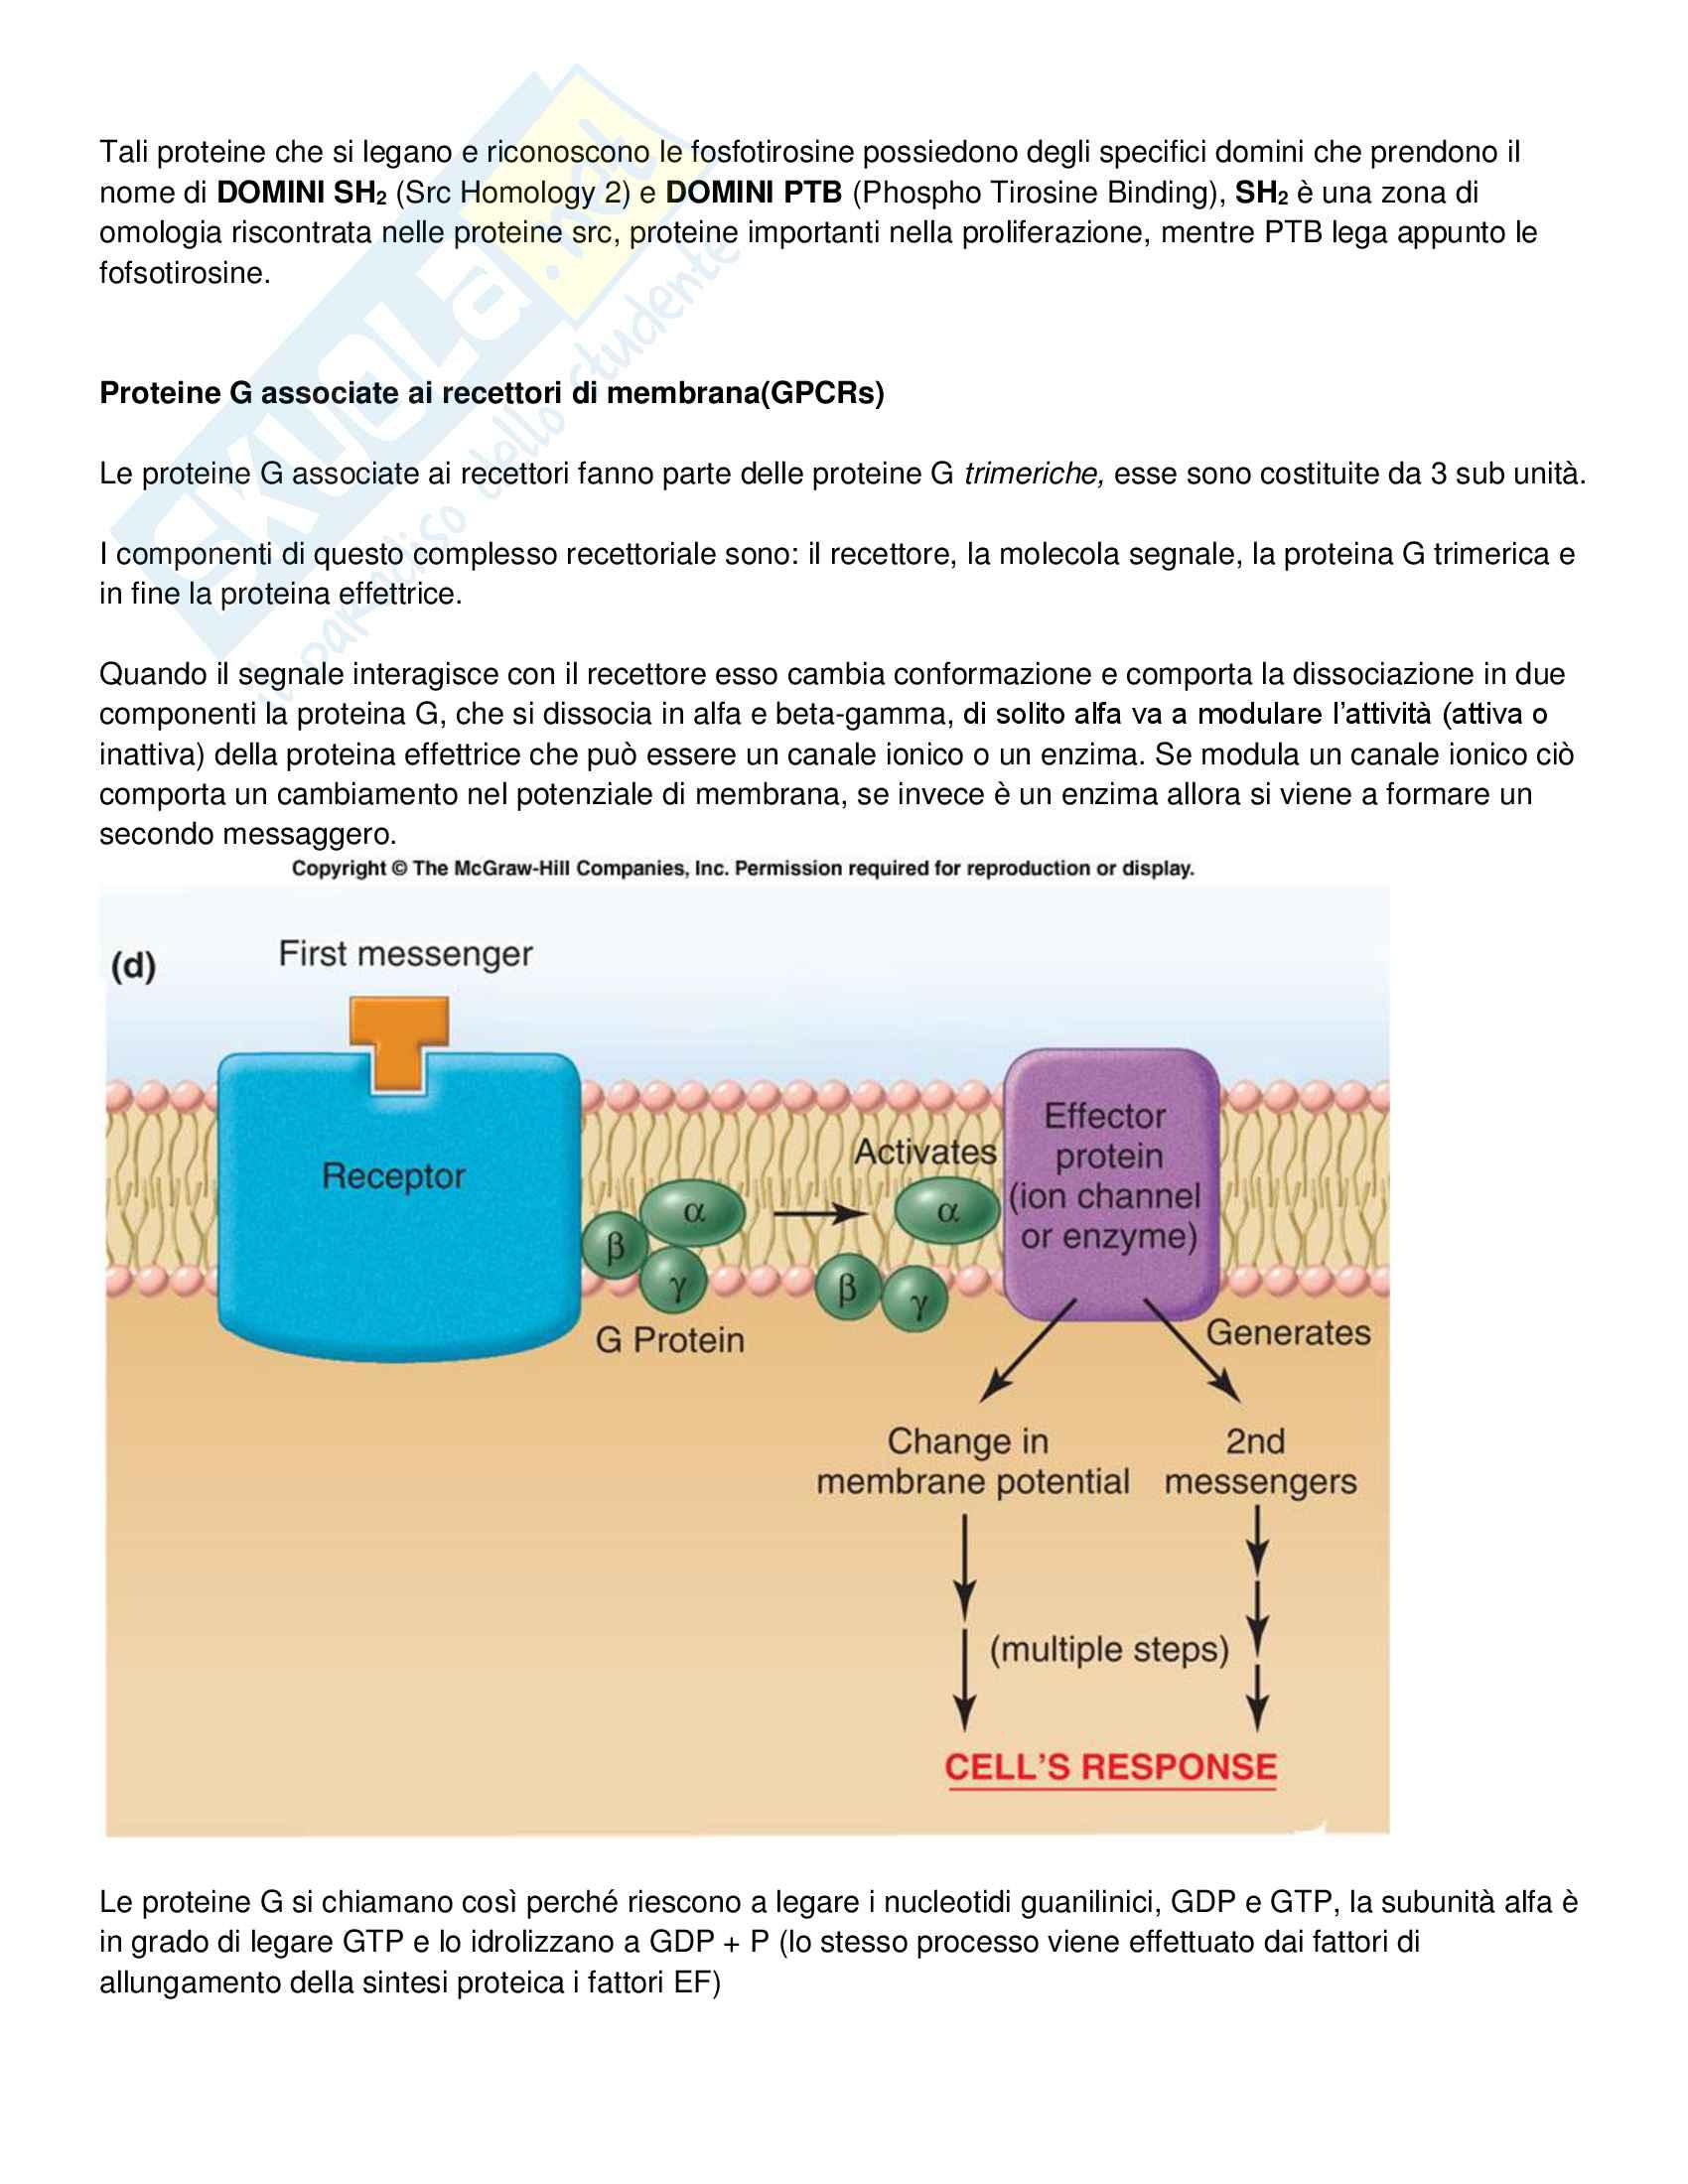 Biochimica per le Biotecnologie Pag. 11